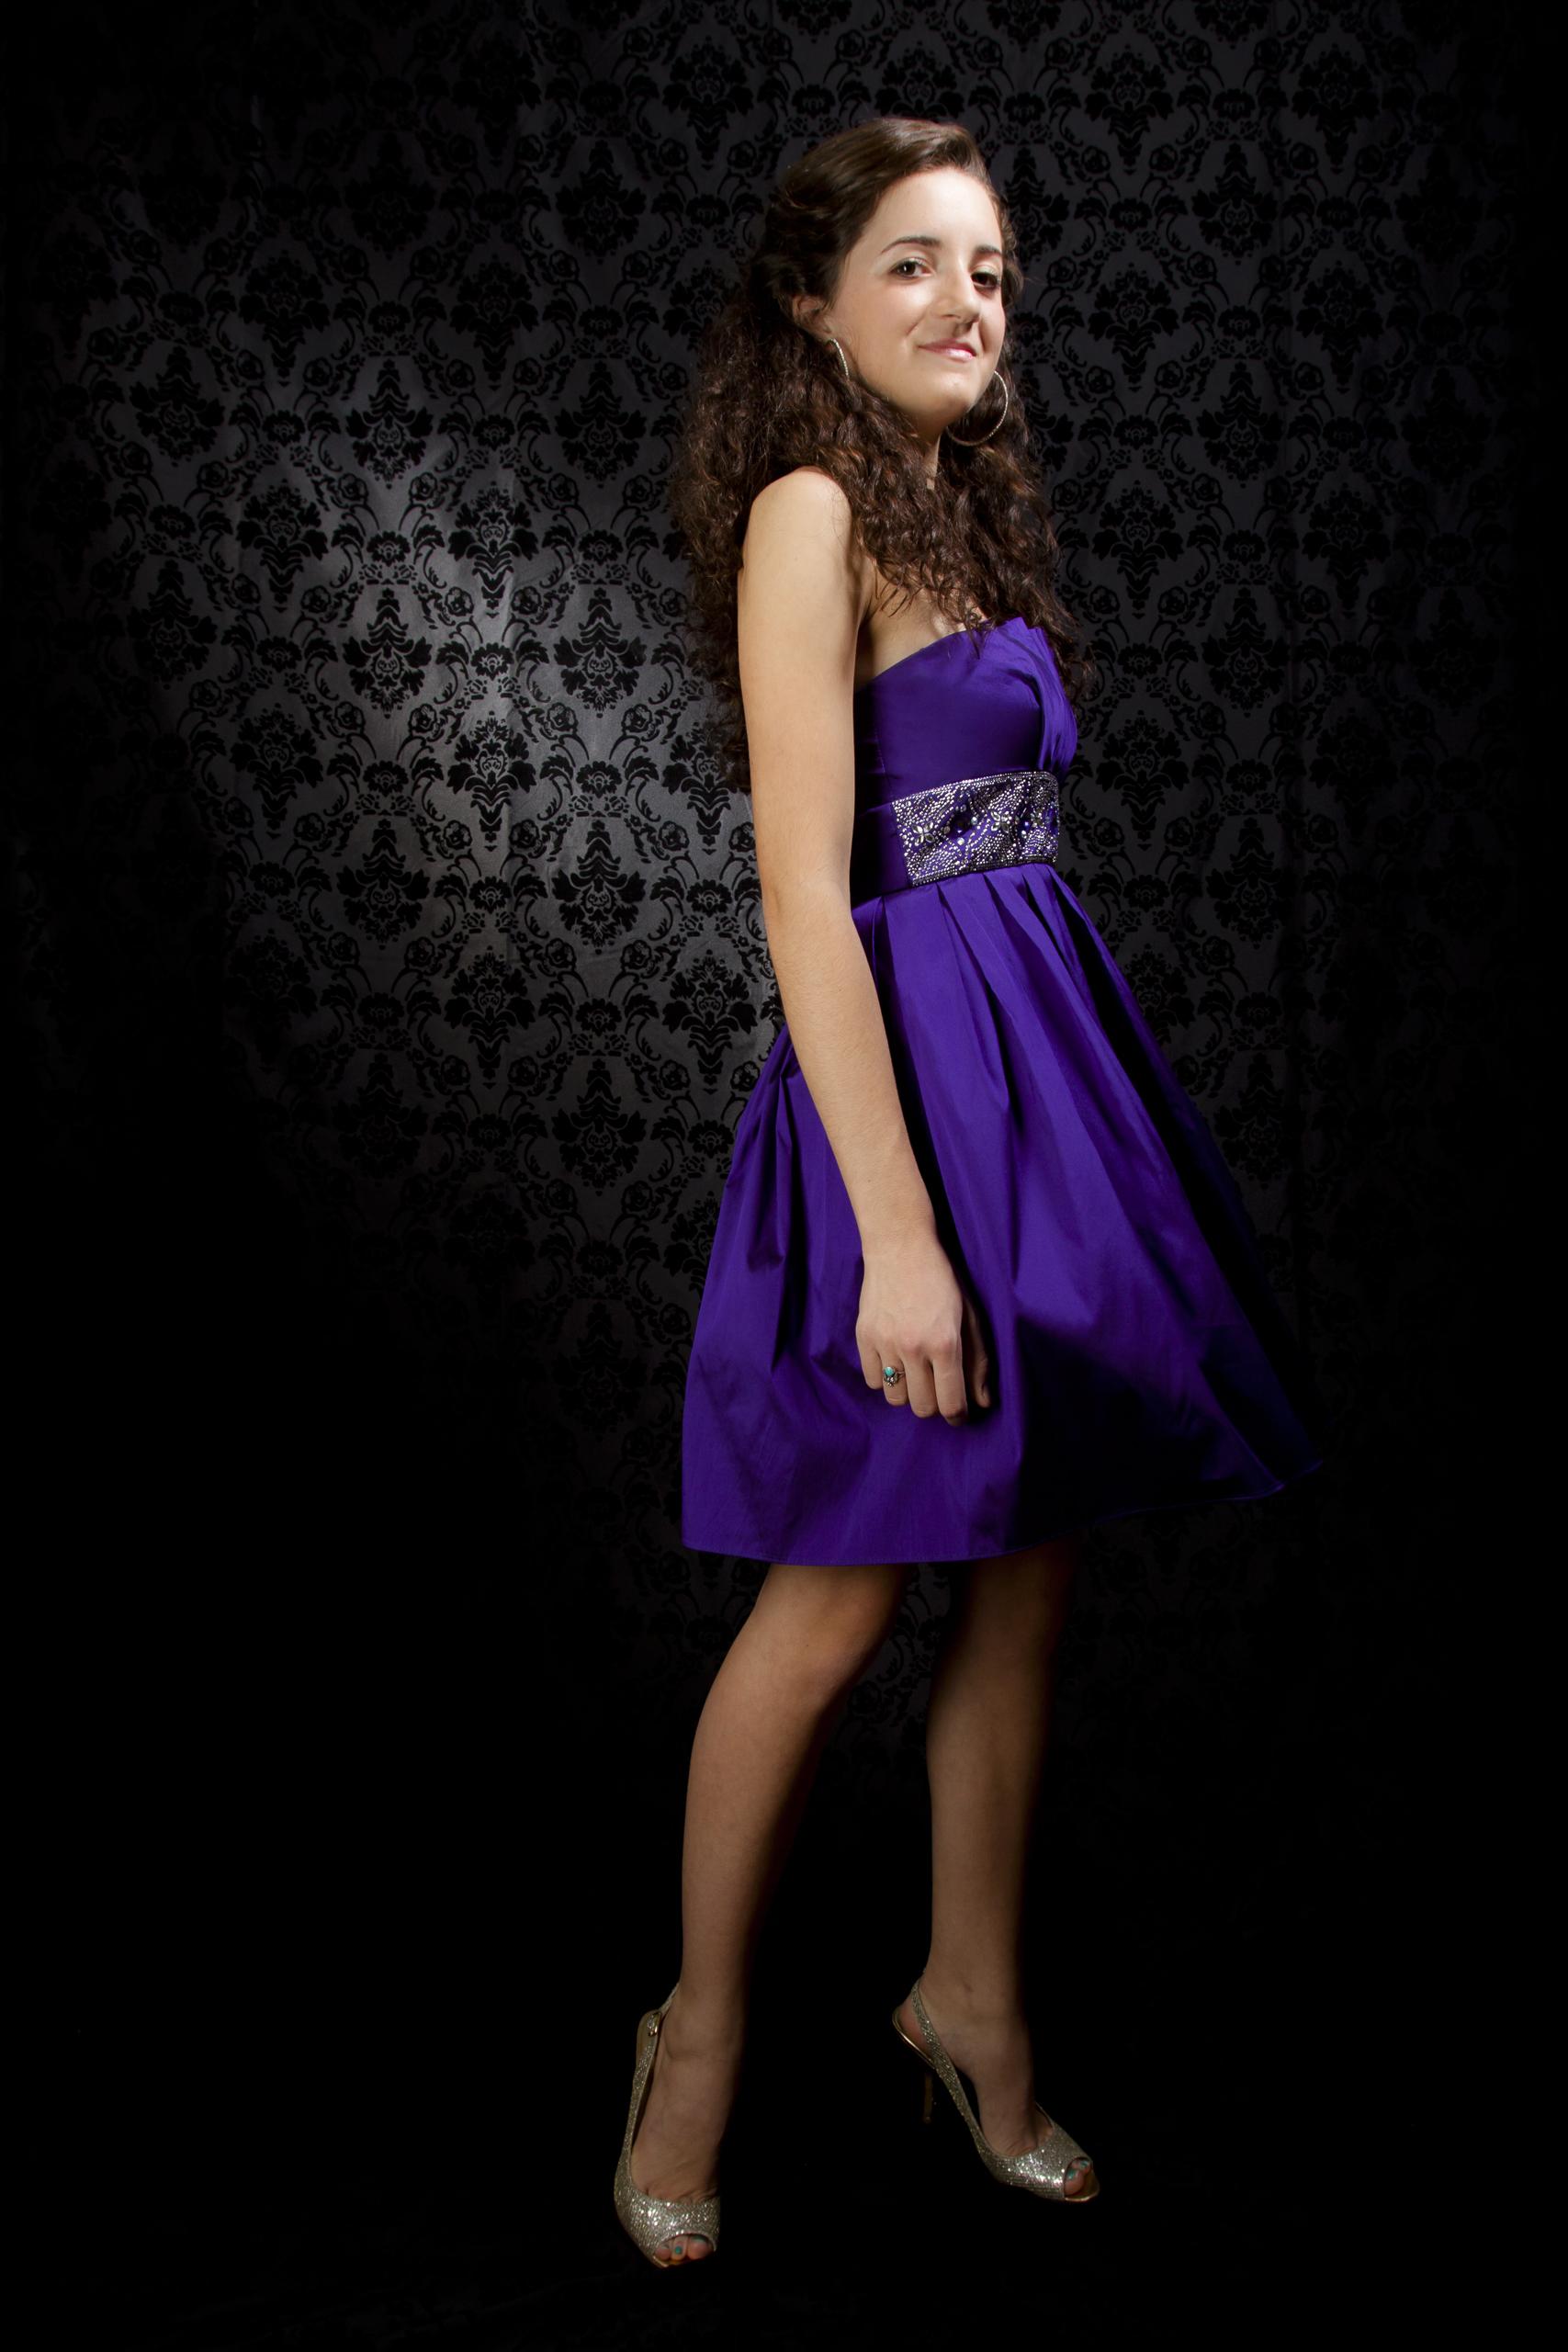 23 modern styled senior portrait session prom dress twirling on black background 8985.jpg